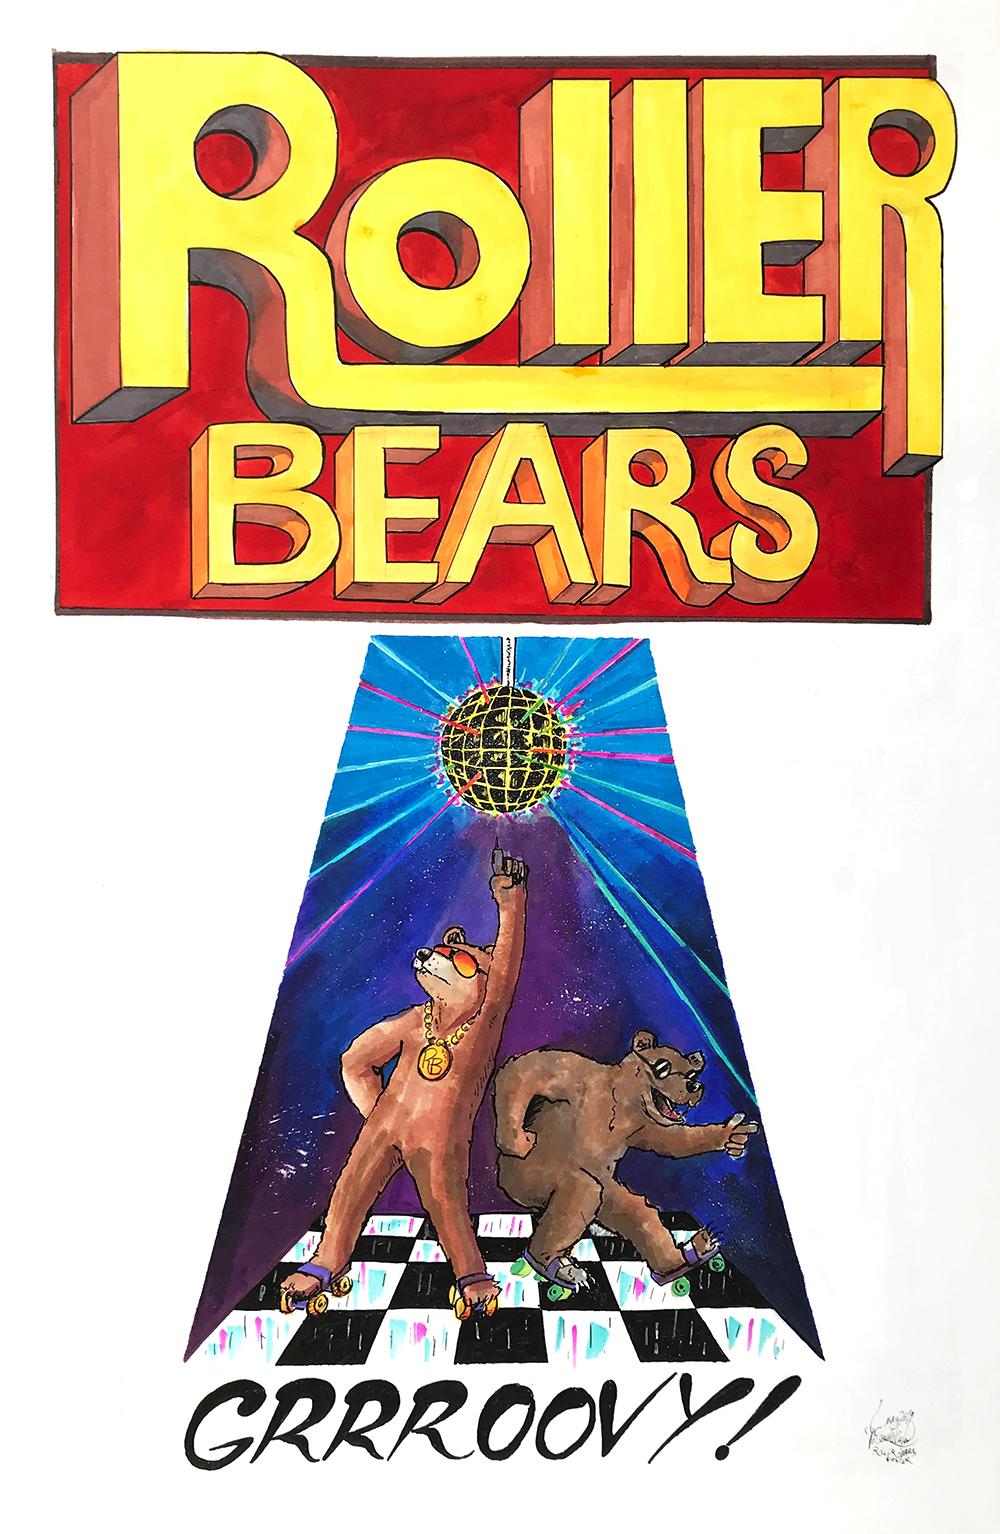 Roller Bears GRRROOVY